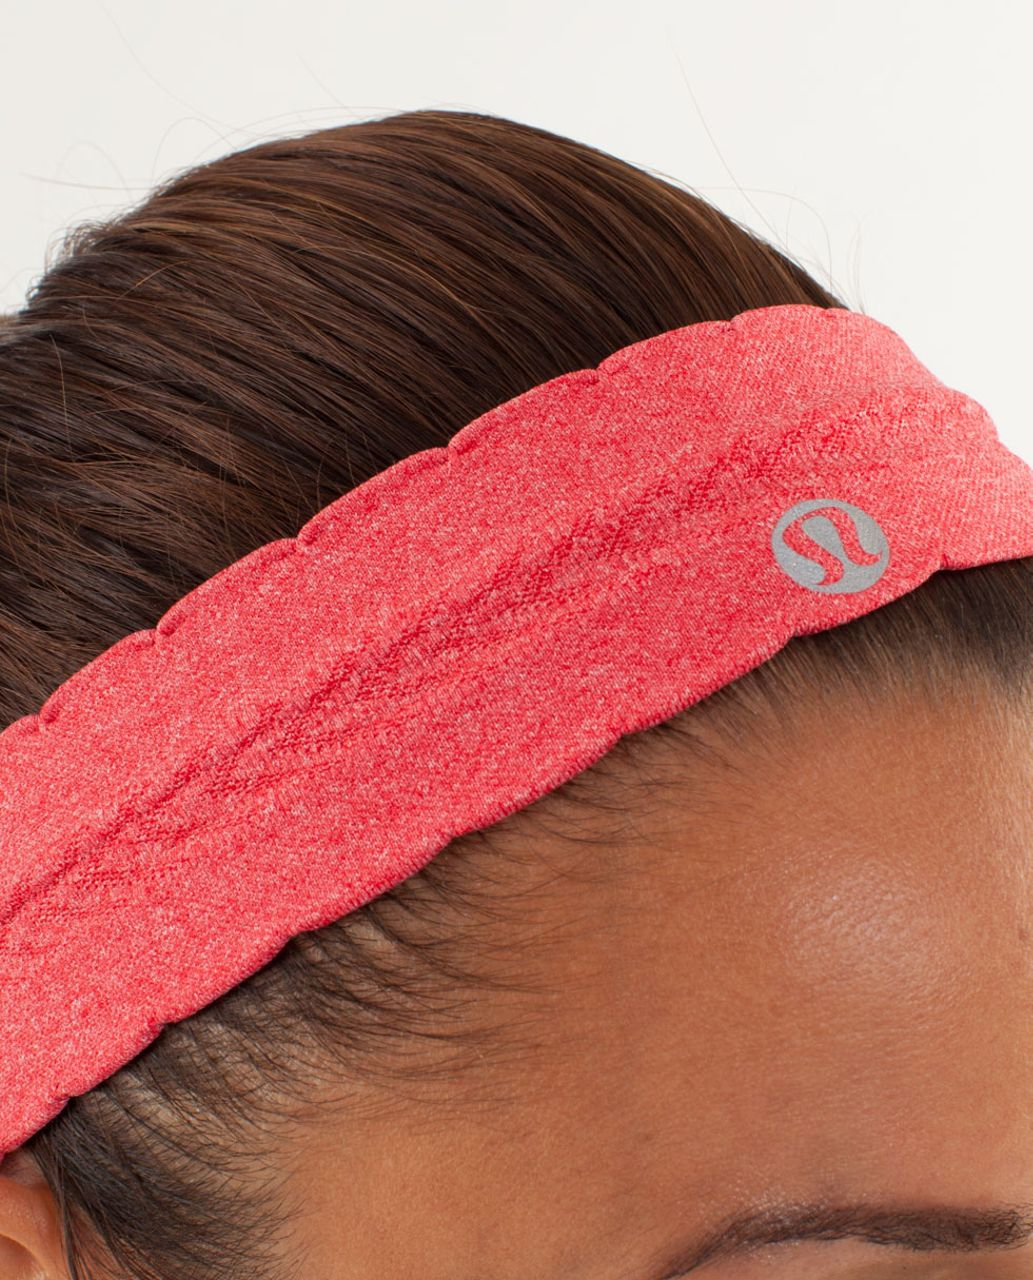 Lululemon Swiftly Headband *Special Edition - Currant